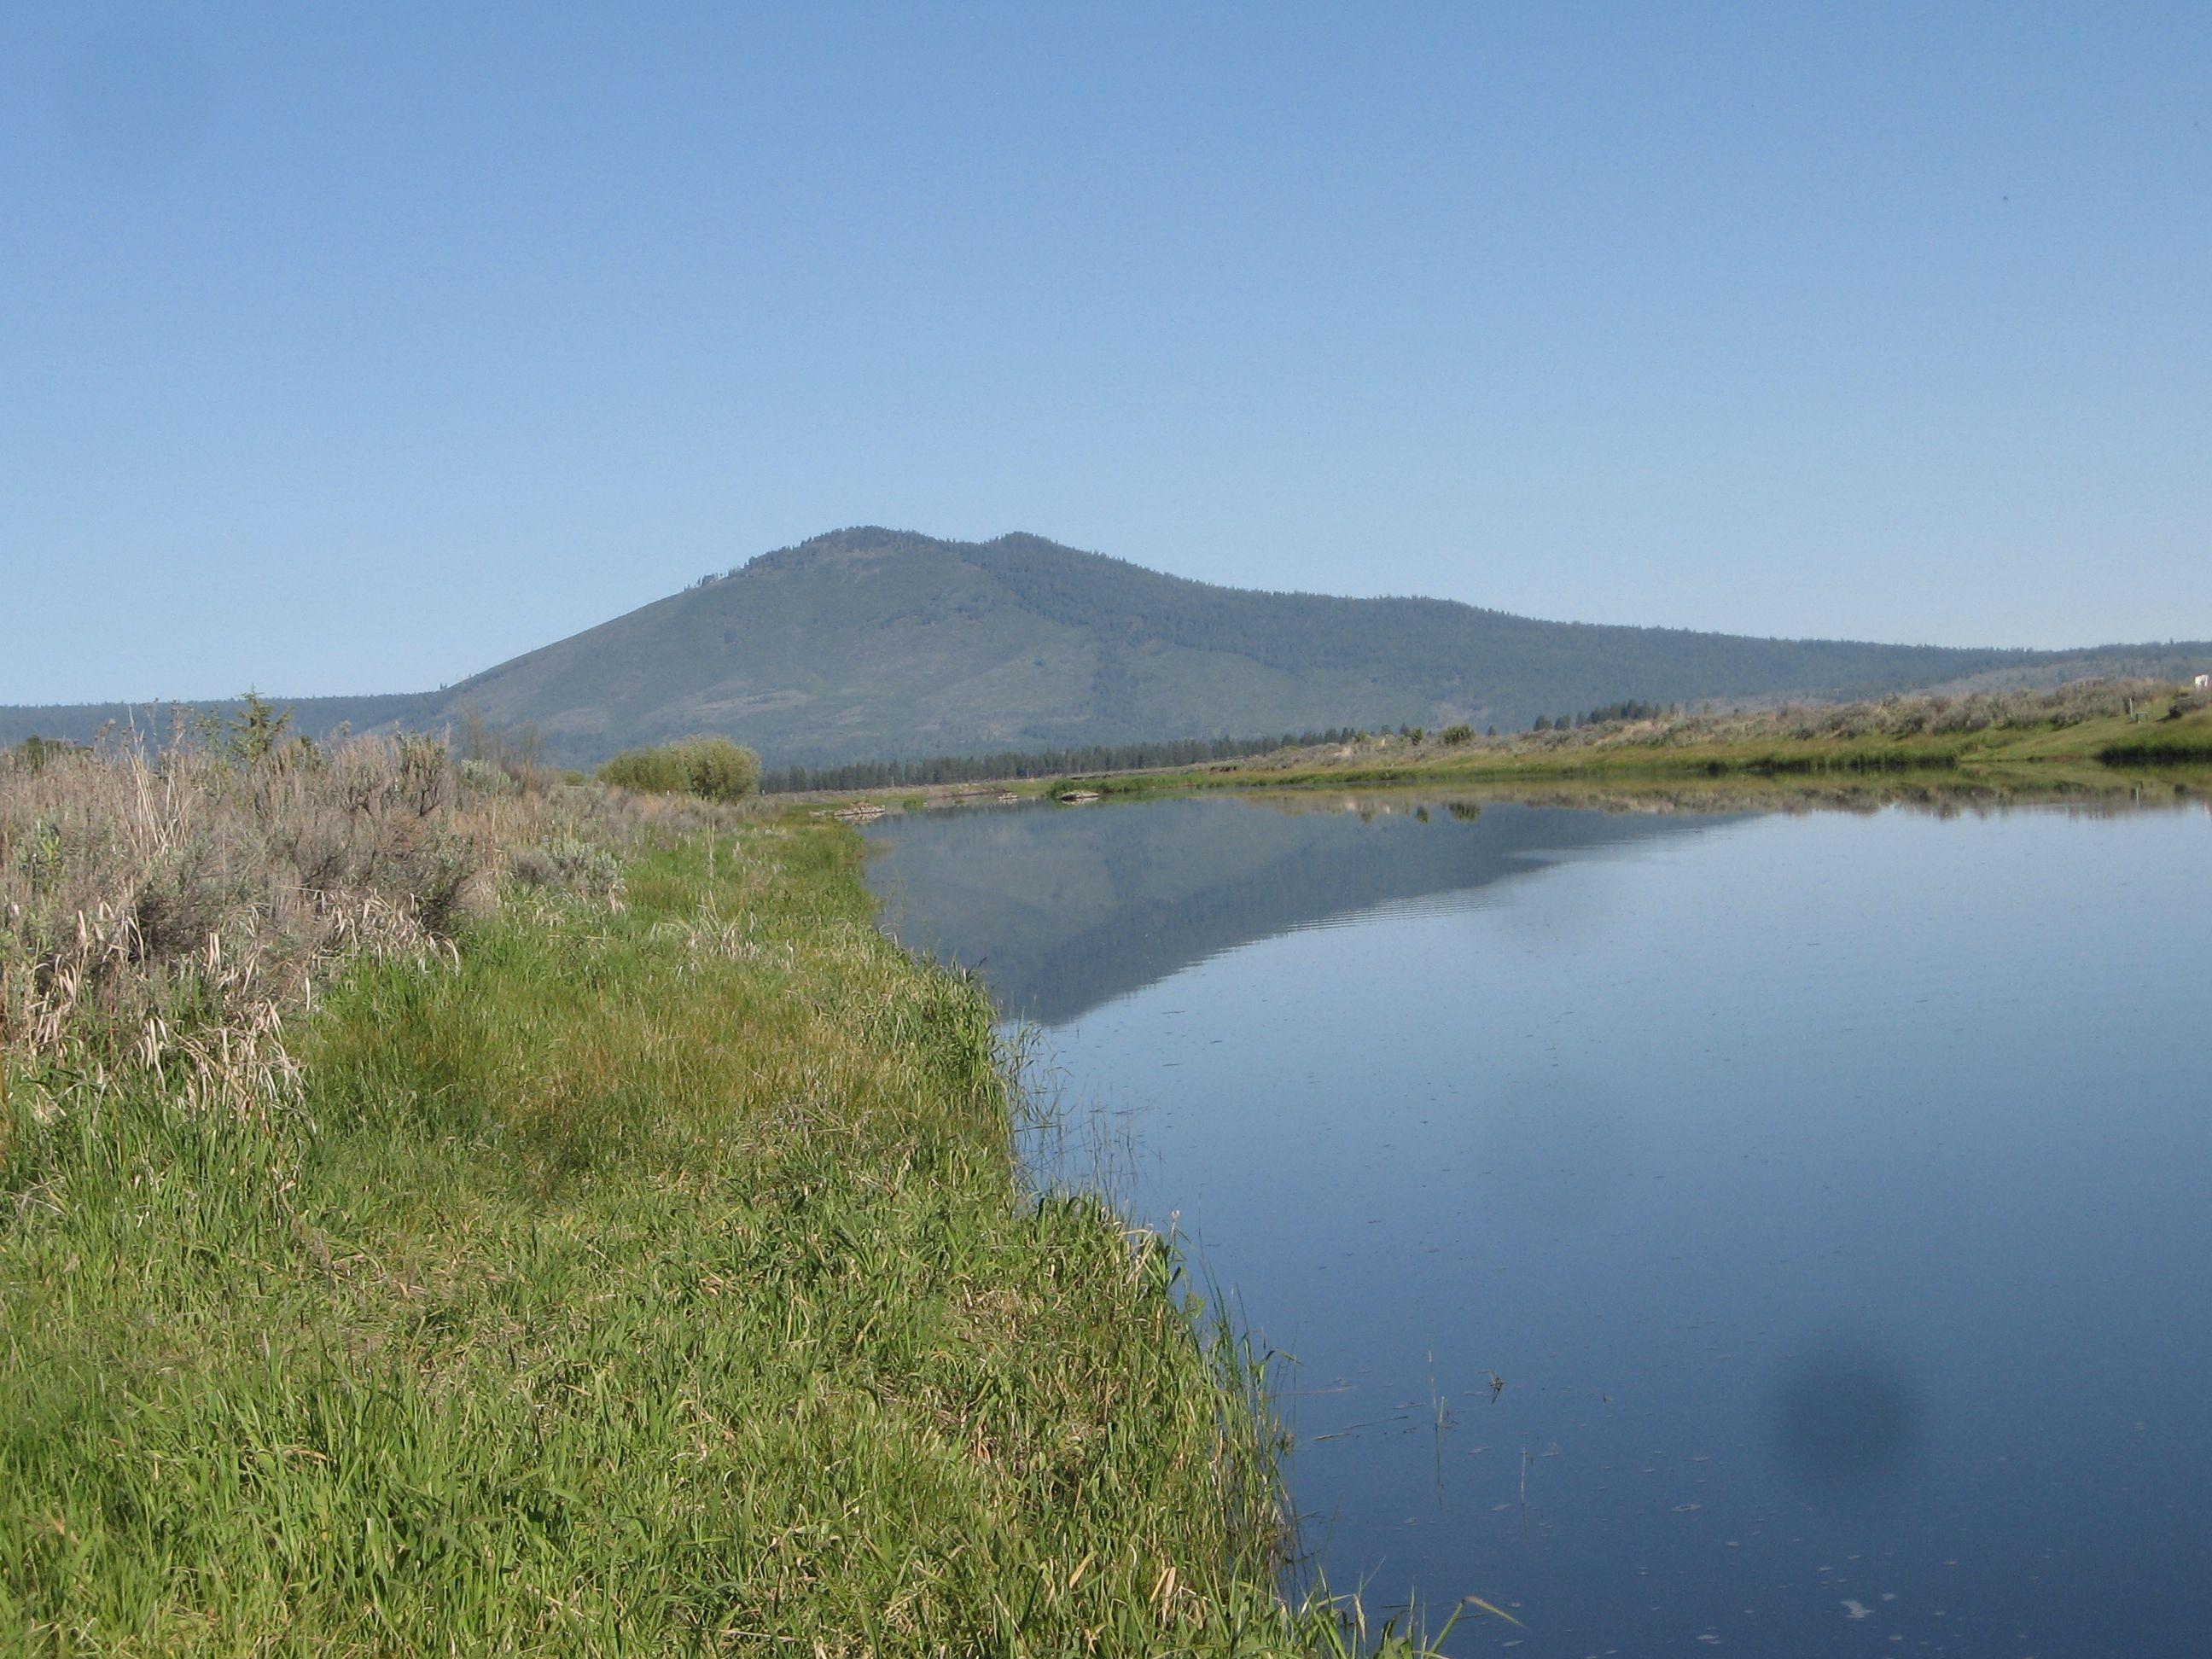 Saddle Mountain from Sprague River Oregon A